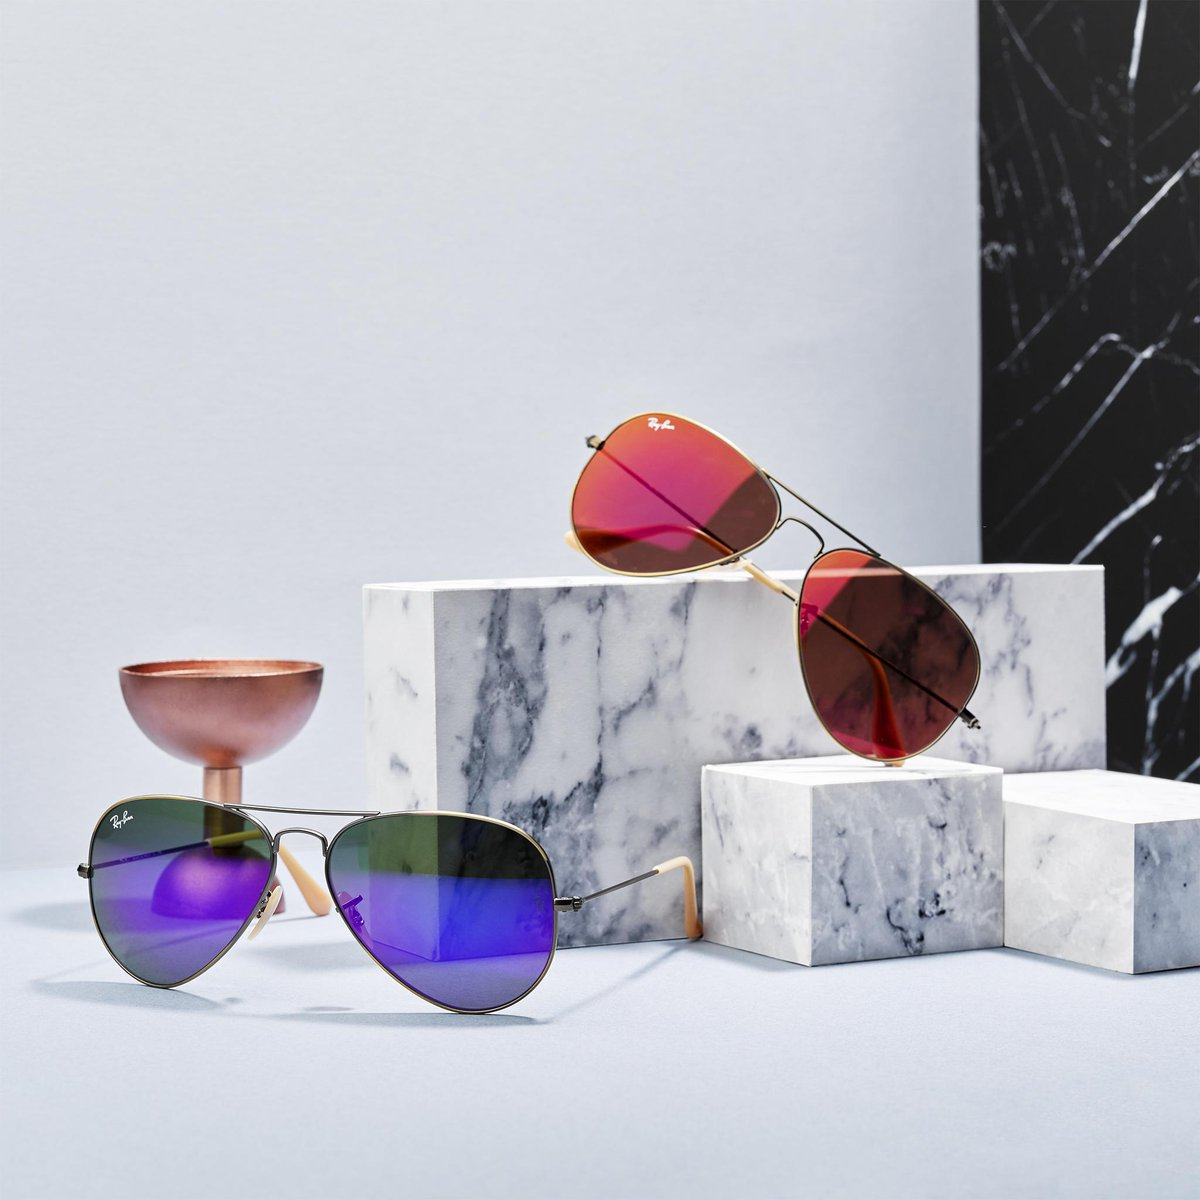 57370a333a Specstore Opticians ( Spec store)